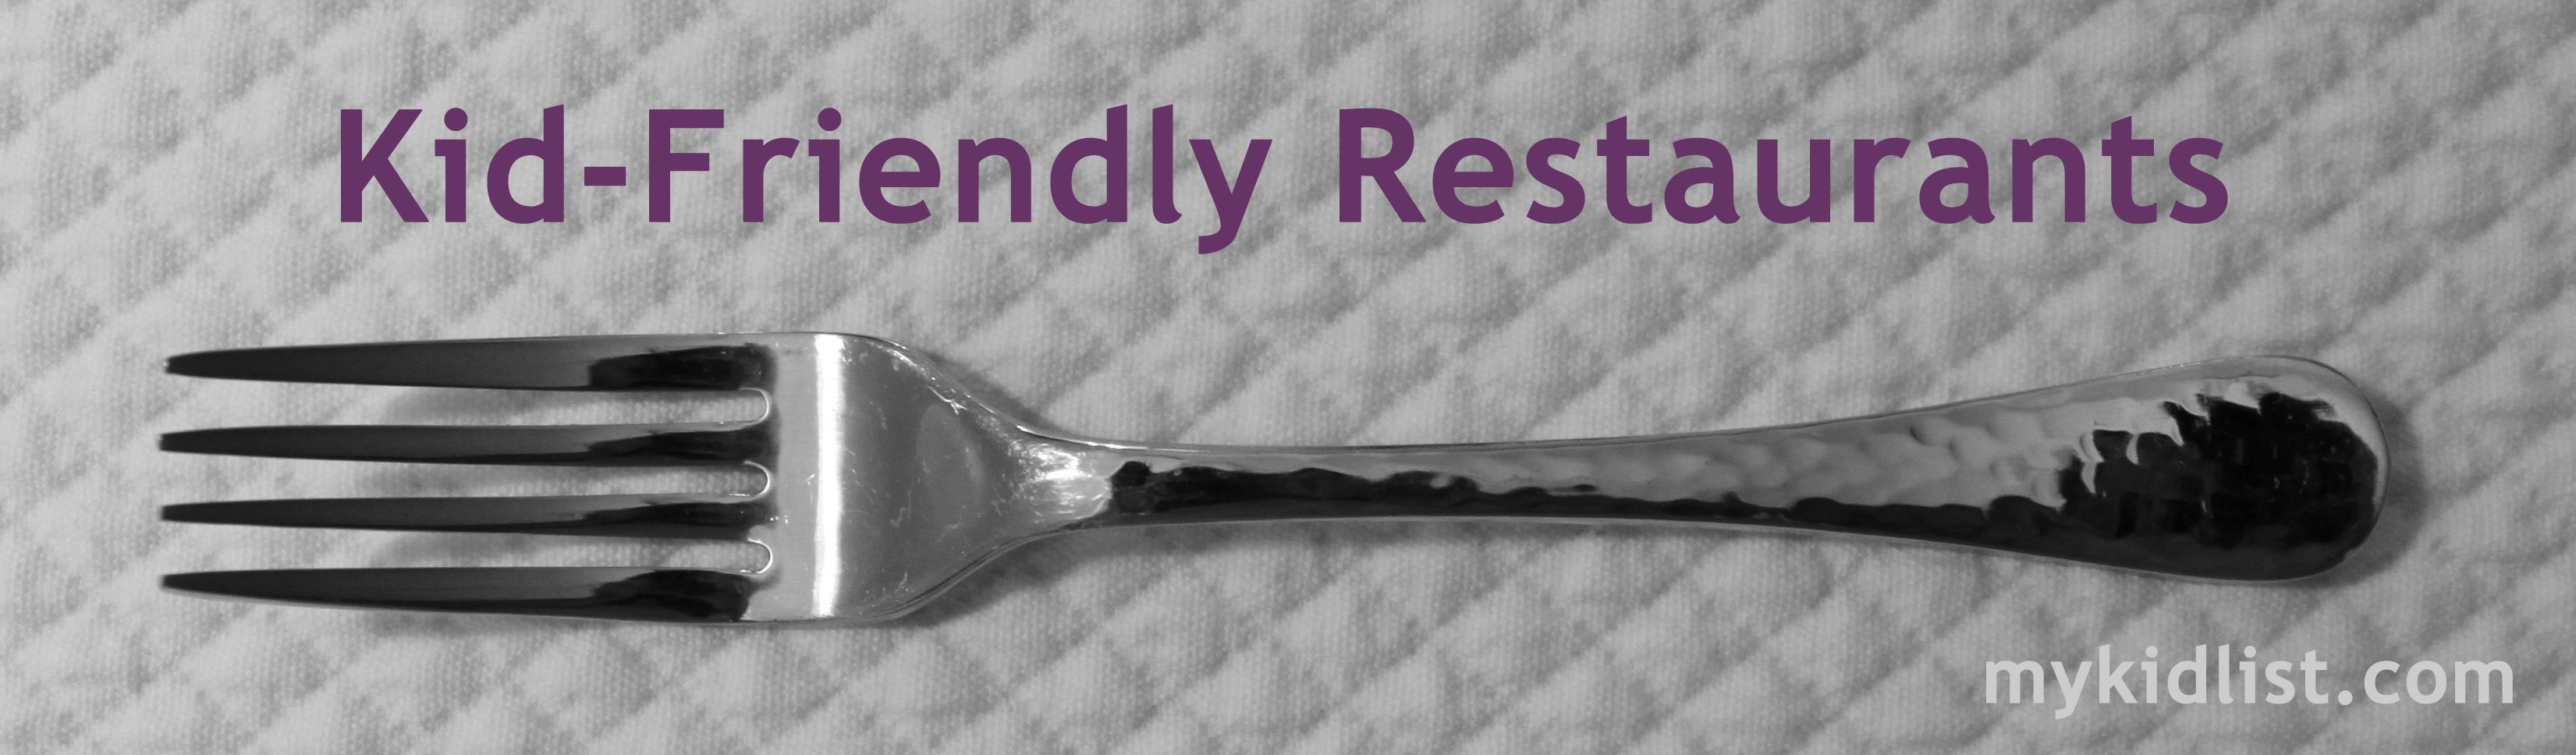 Kid-Friendly Restaurants: Oak Brook, Oakbrook Terrace - kidlist ...